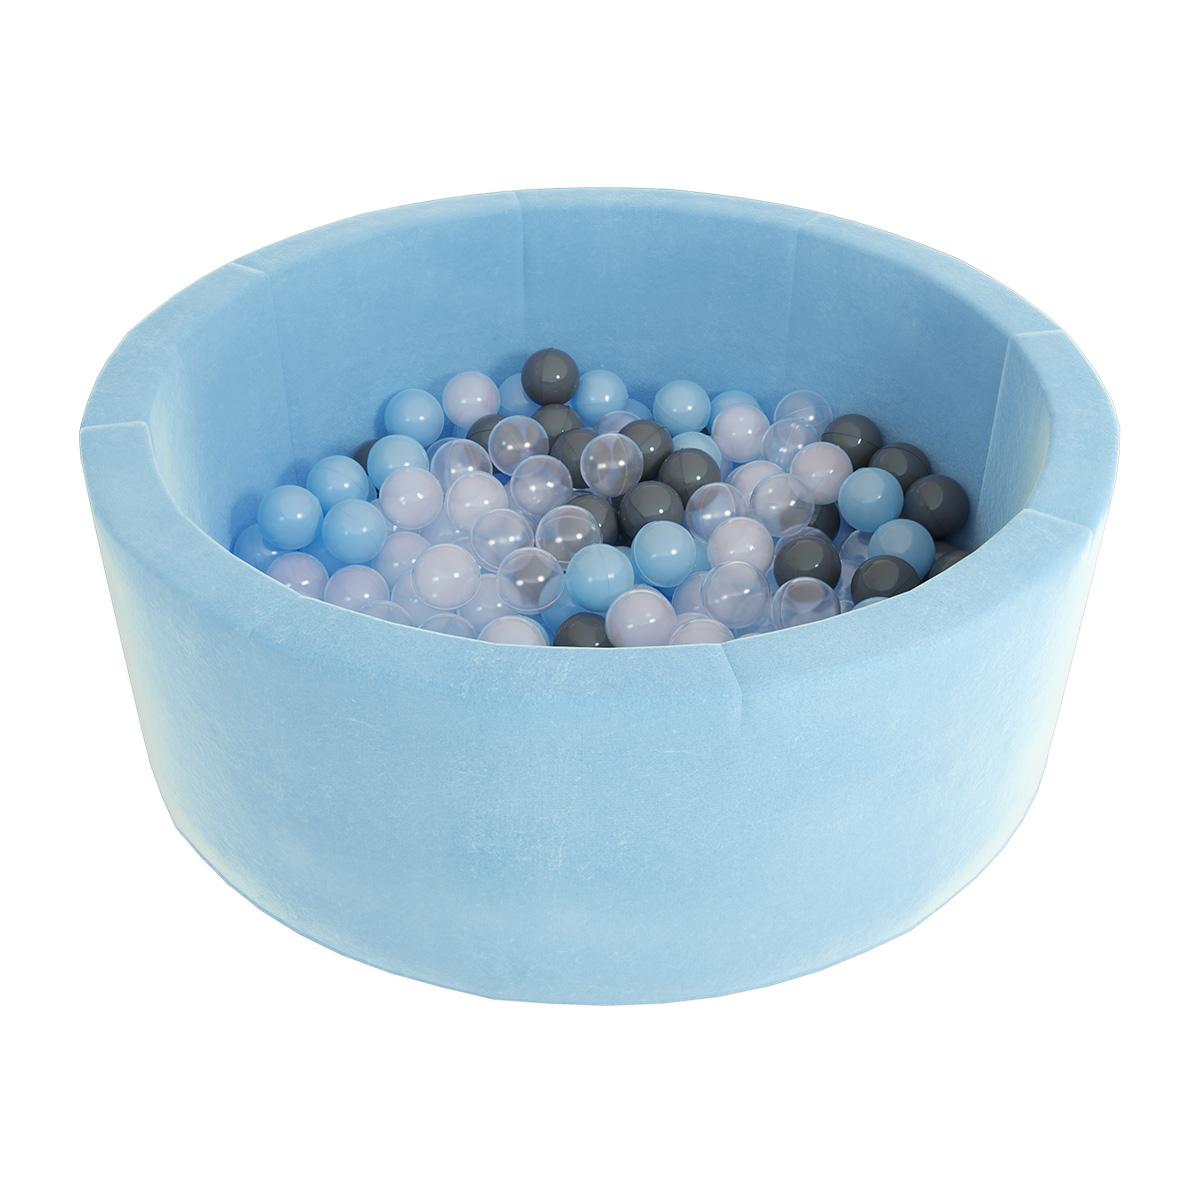 Купить Детский сухой бассейн Romana Airpool Max голубой со 100 шарами, Romana (Романа)